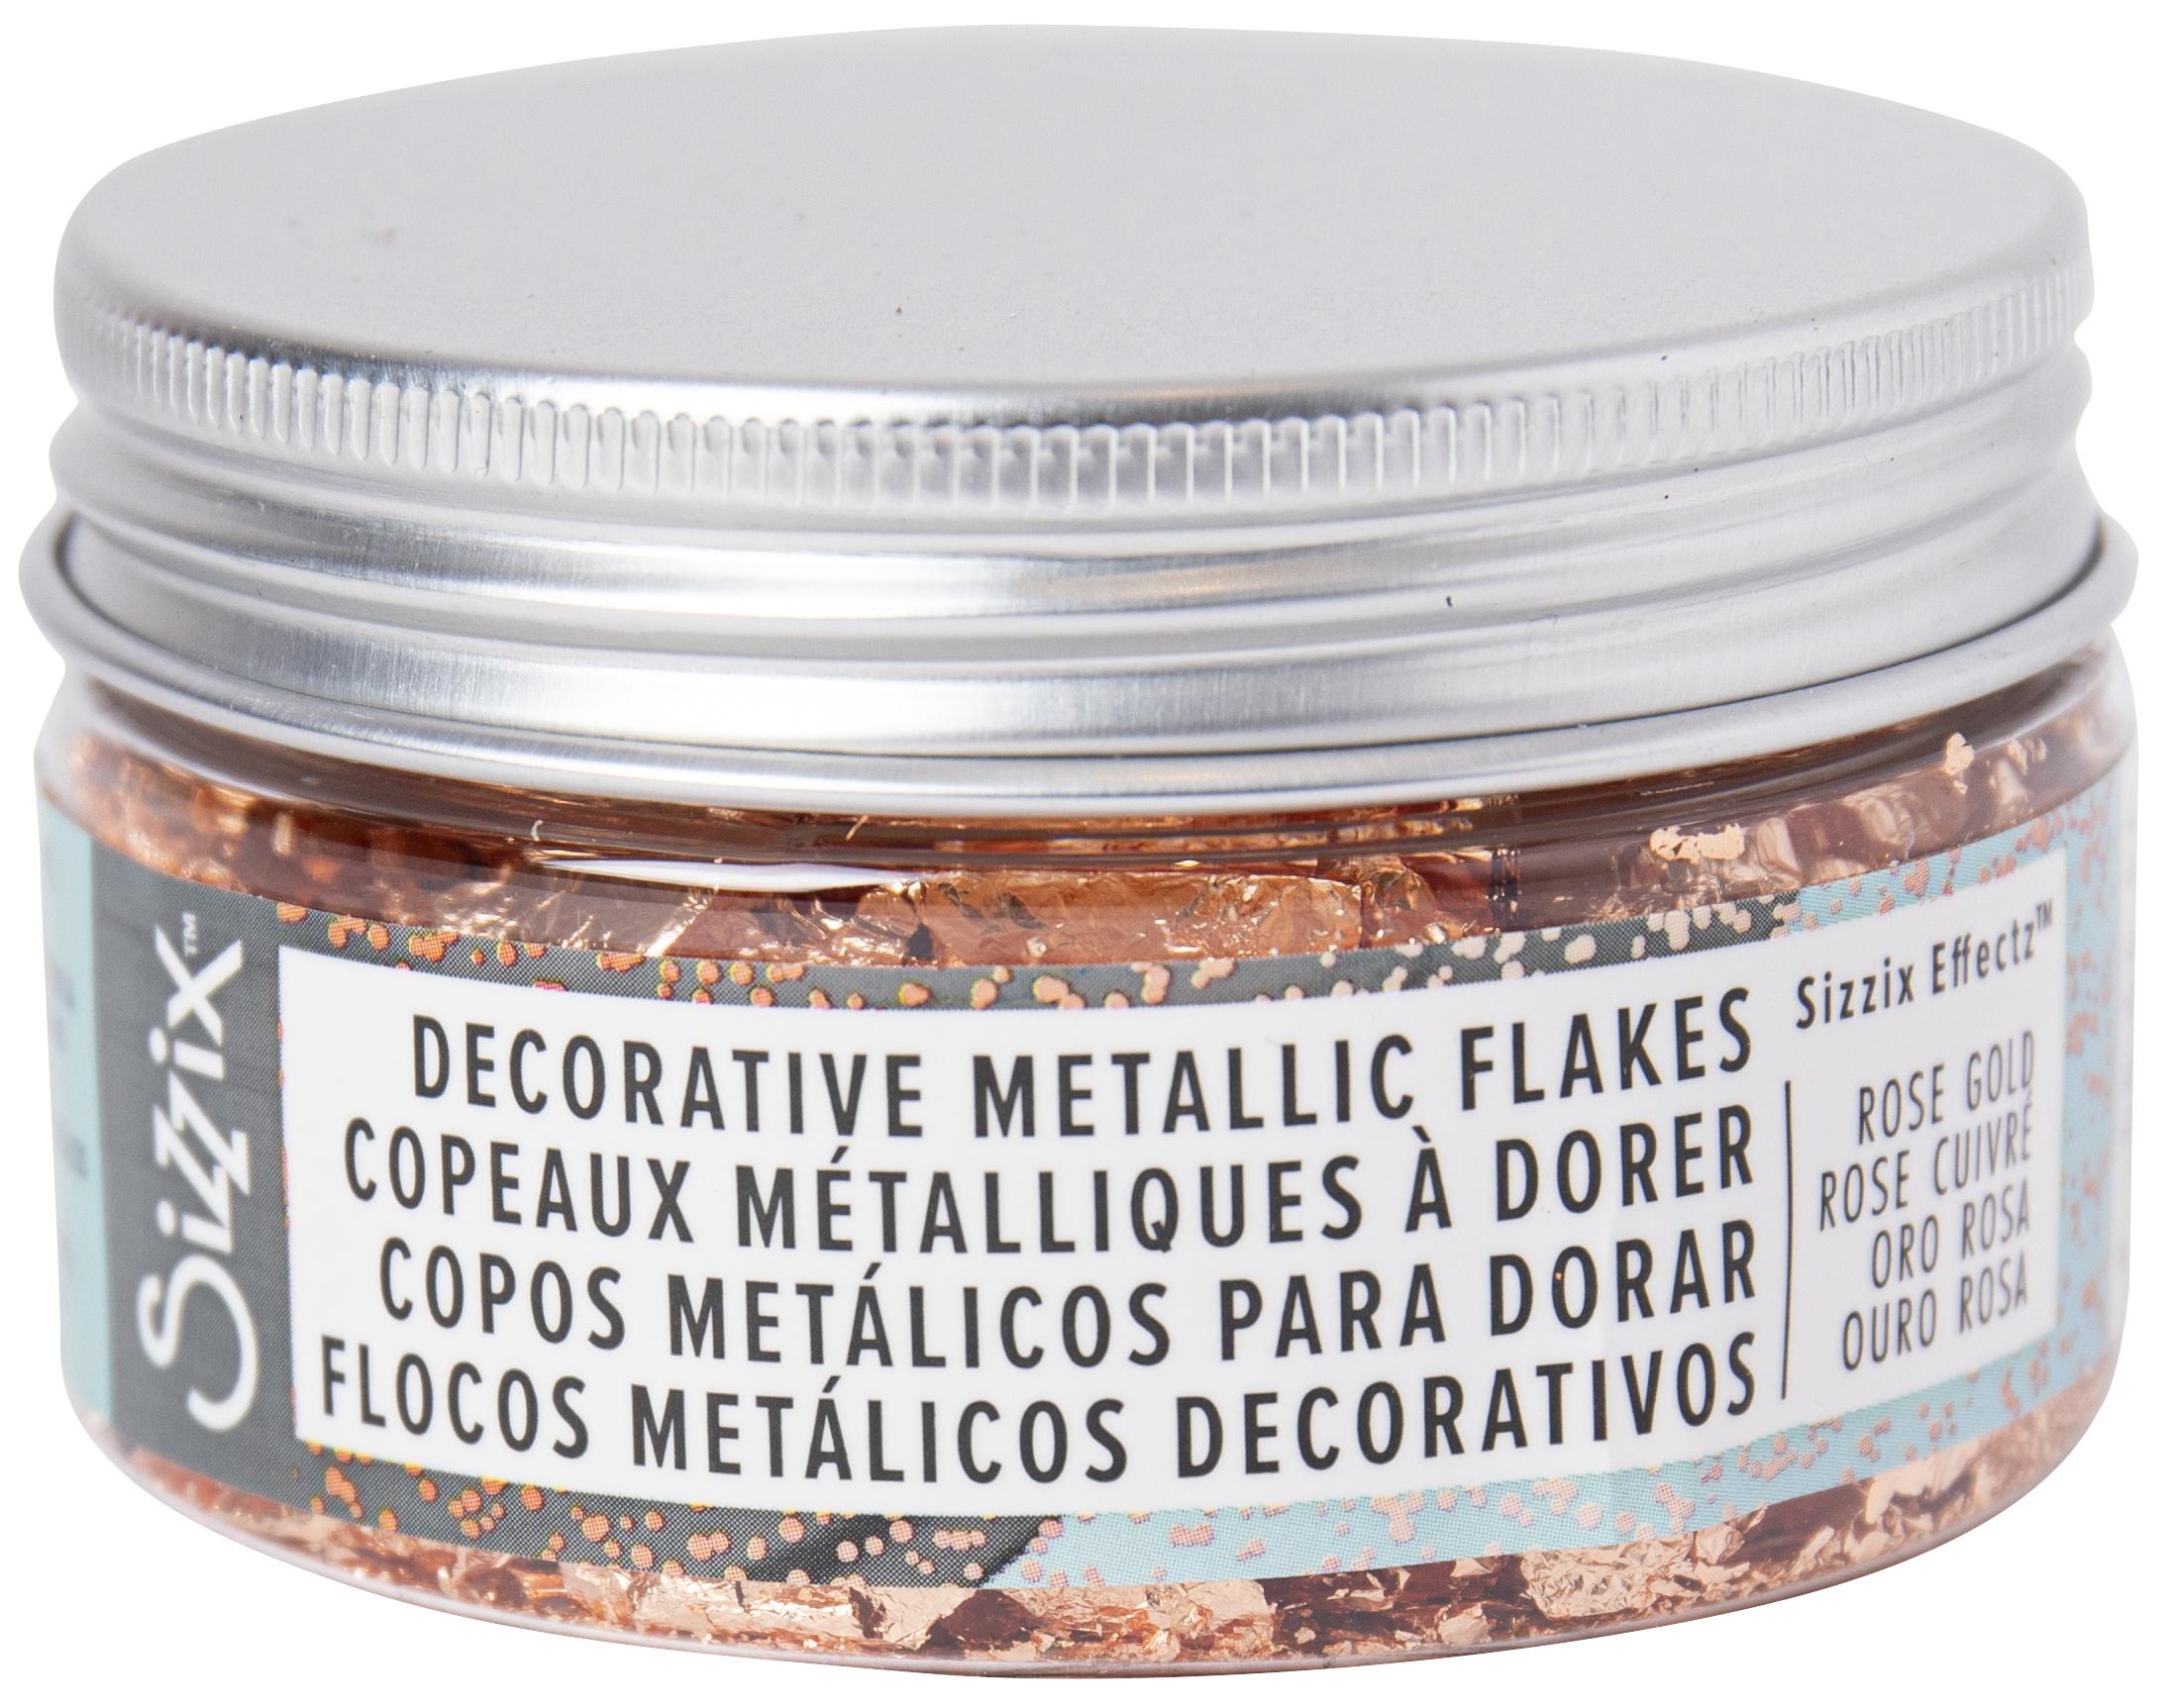 Sizzix Effectz Decorative Metallic Flakes 100ml-Rose Gold